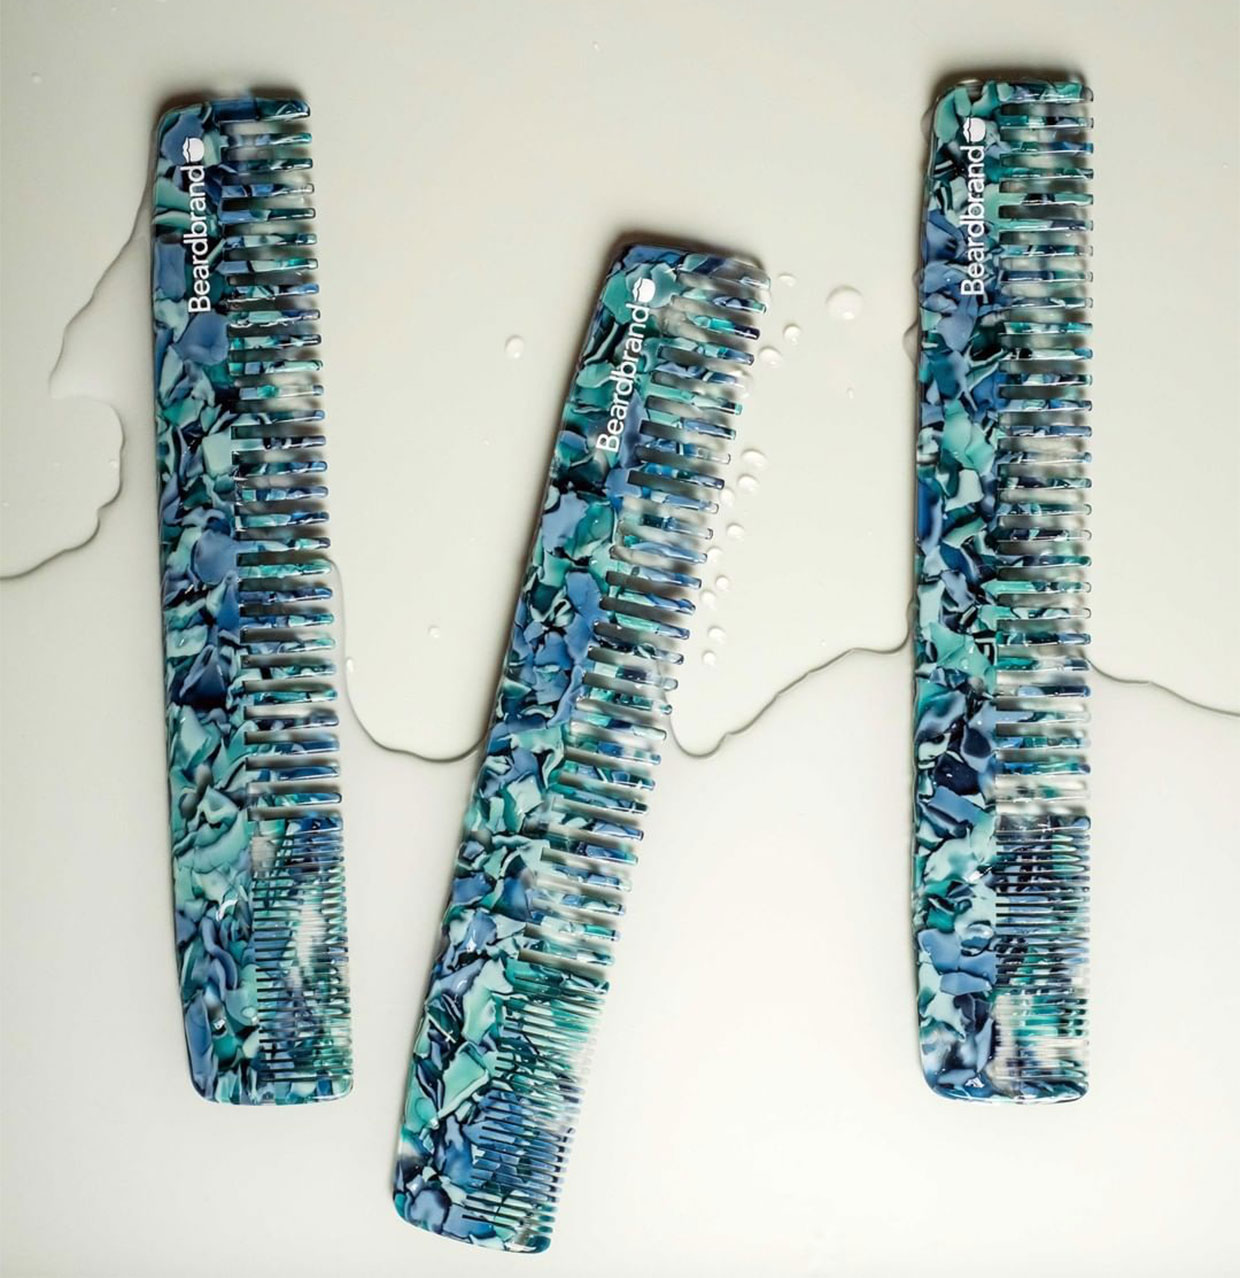 Beardbrand Beard Combs